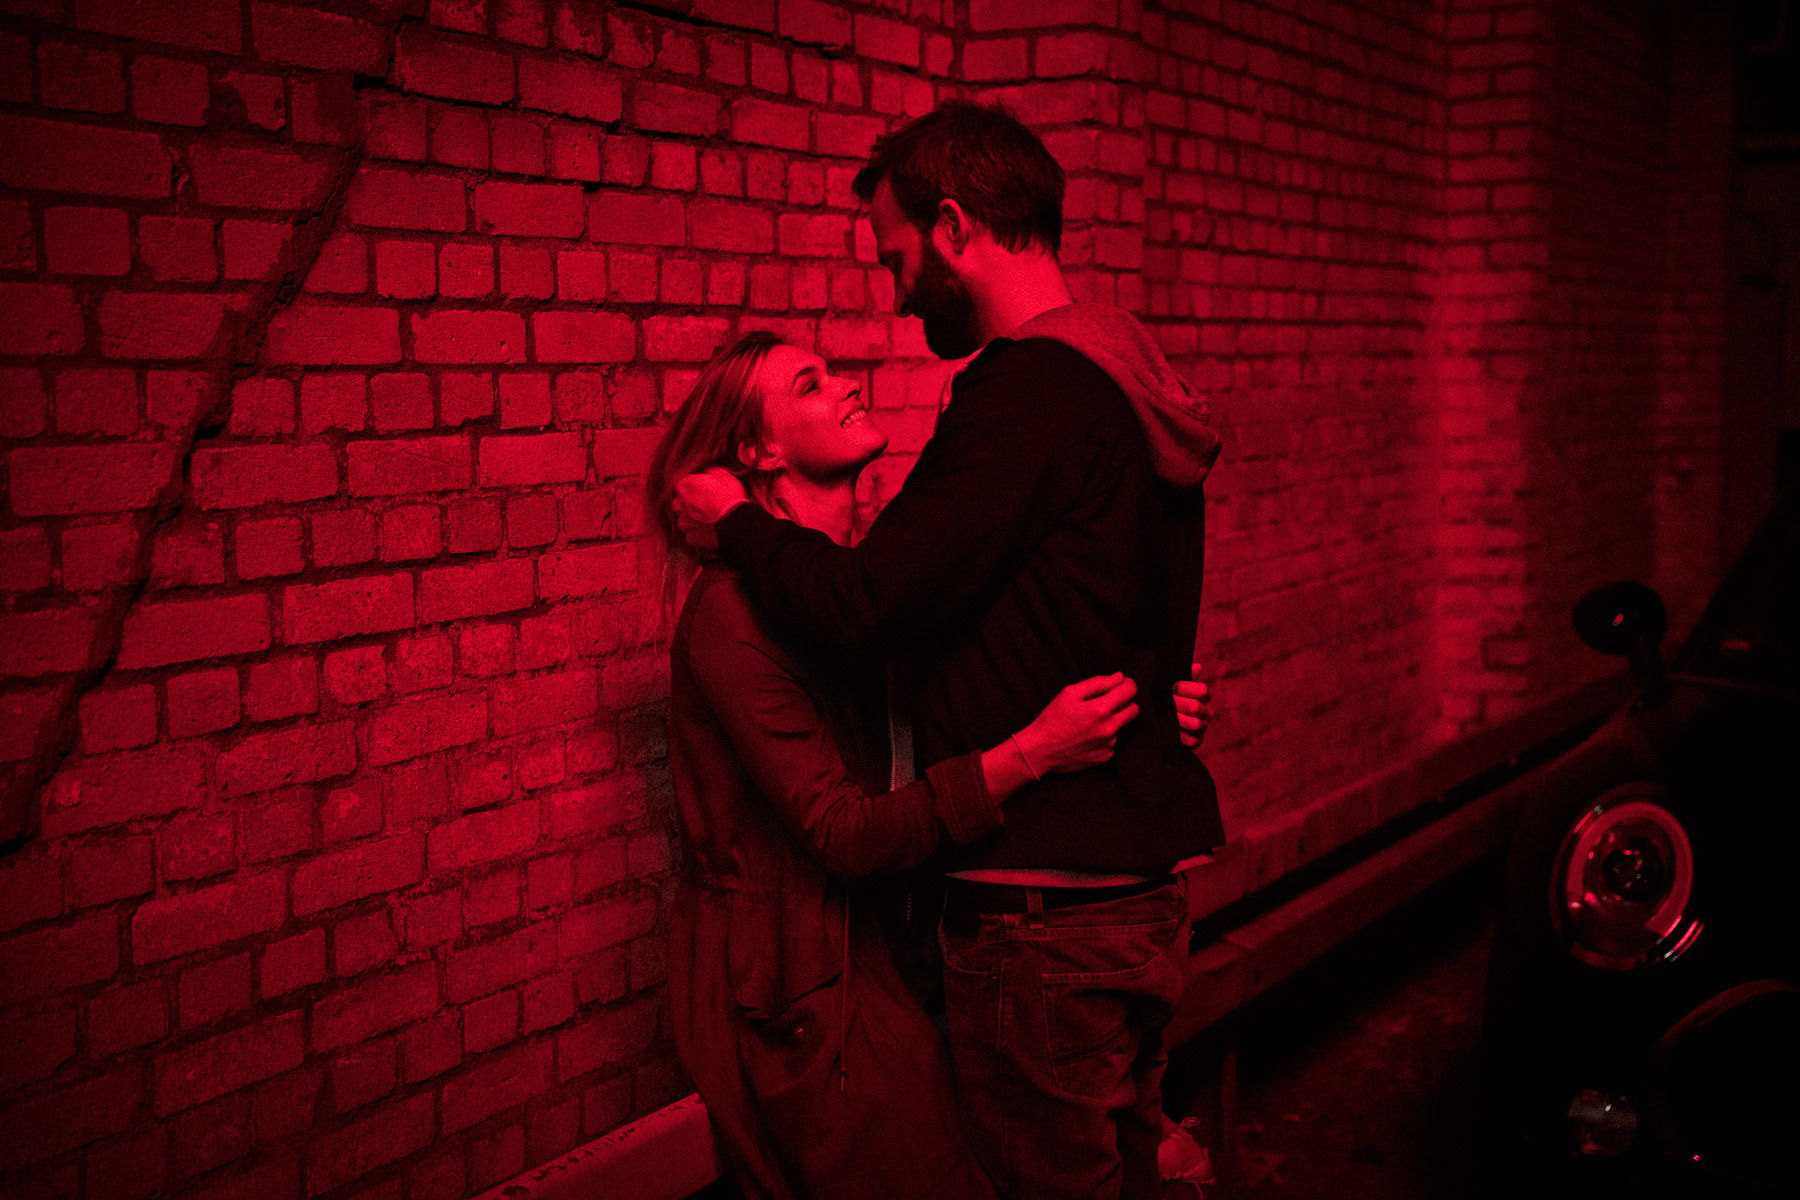 DOUBLE T PHOTOGRAPHERS: Maik Floeder - A Love Story